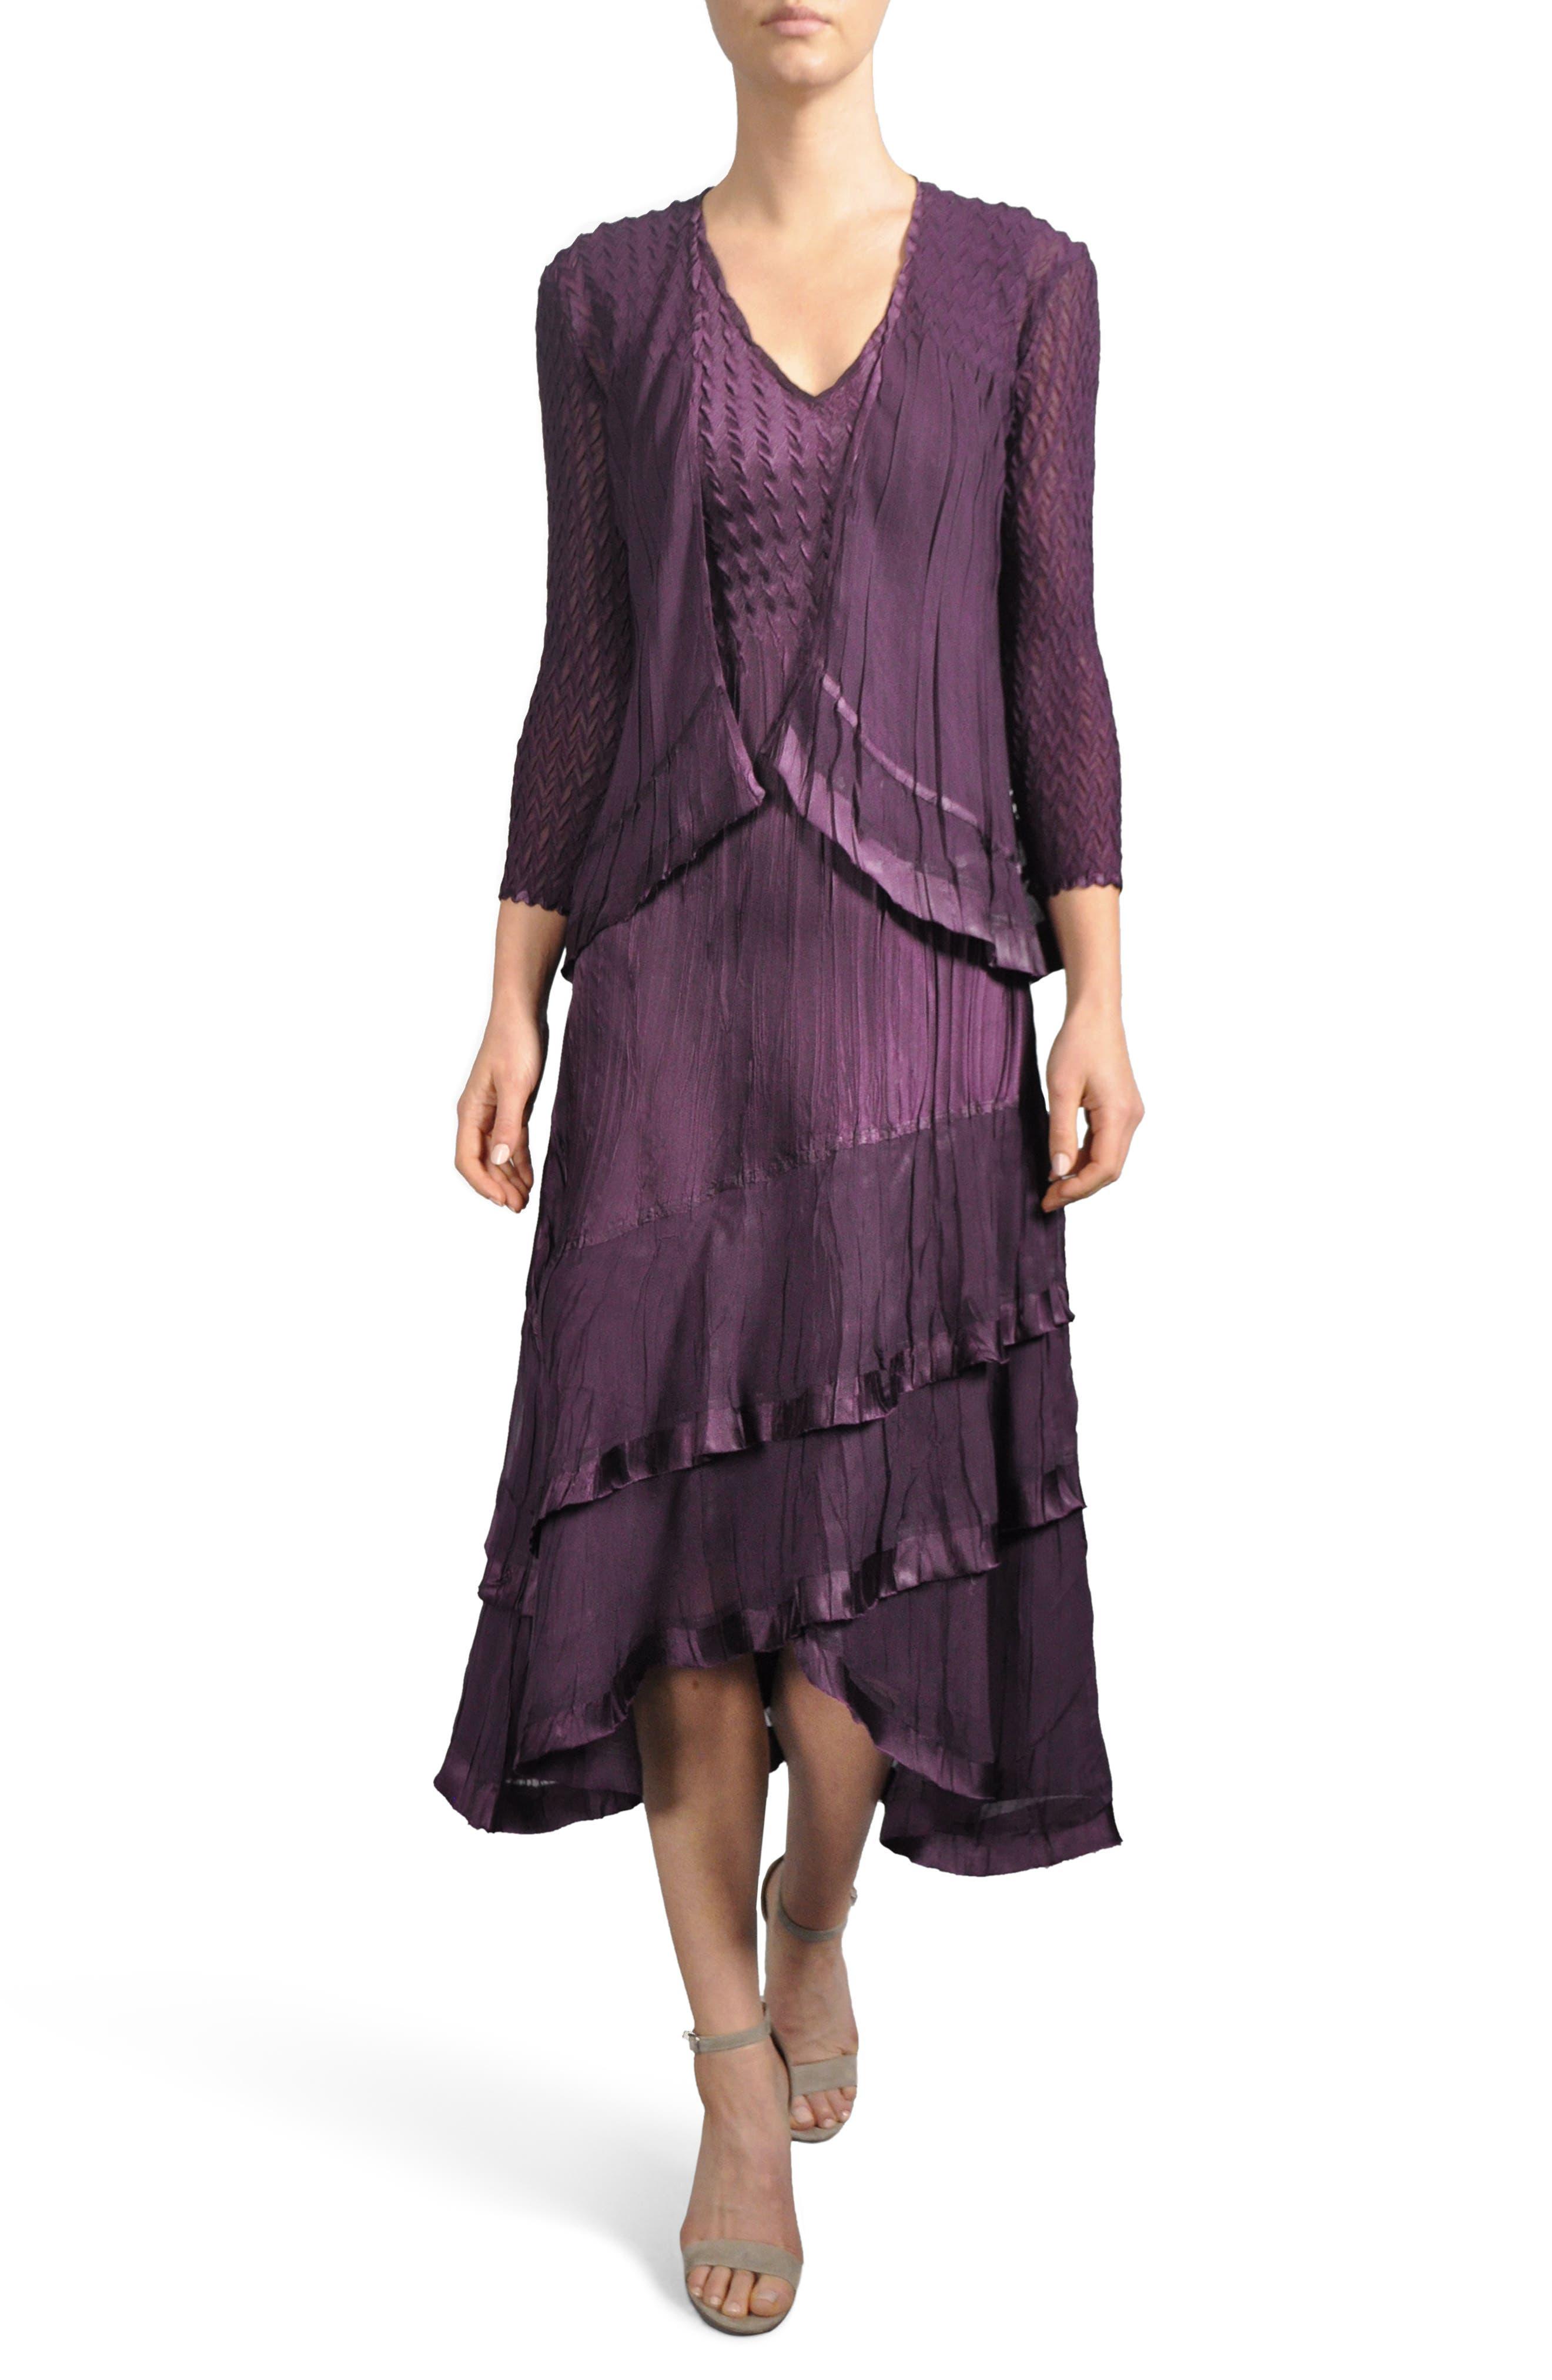 Purple Wedding Guest Petite Dresses for Women   Nordstrom